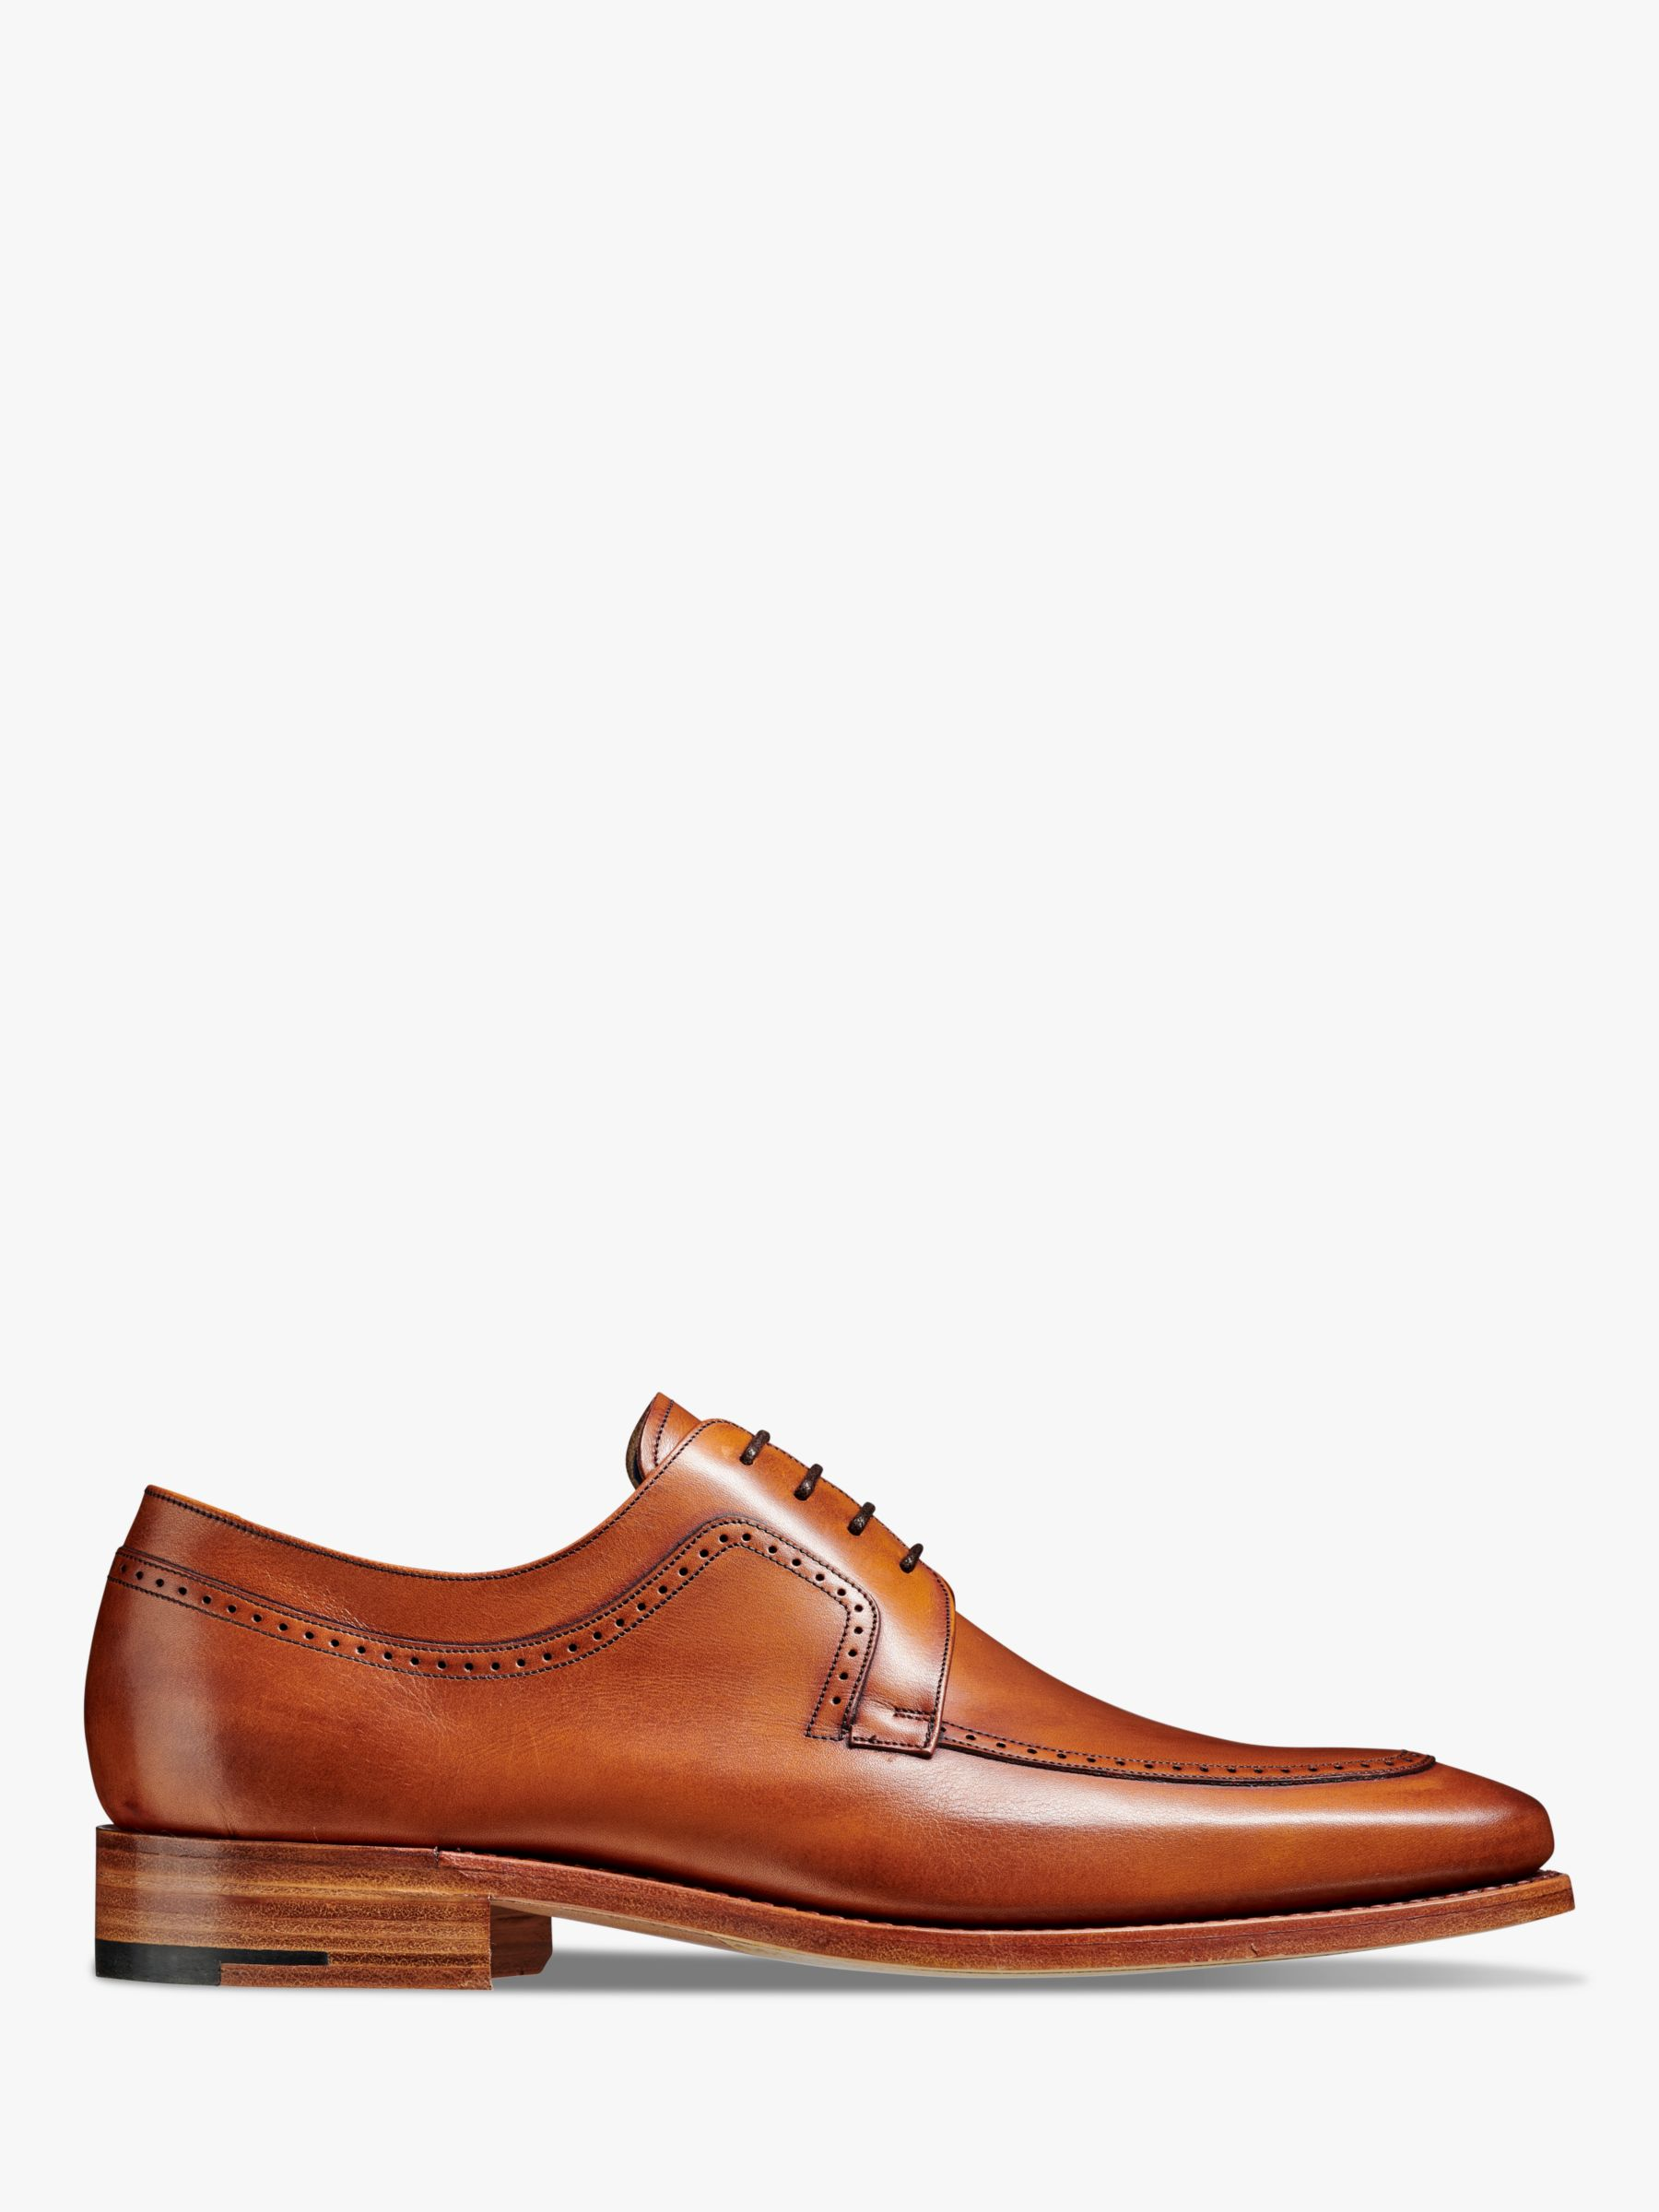 Barker Barker Anthony Leather Shoes, Antique Rosewood